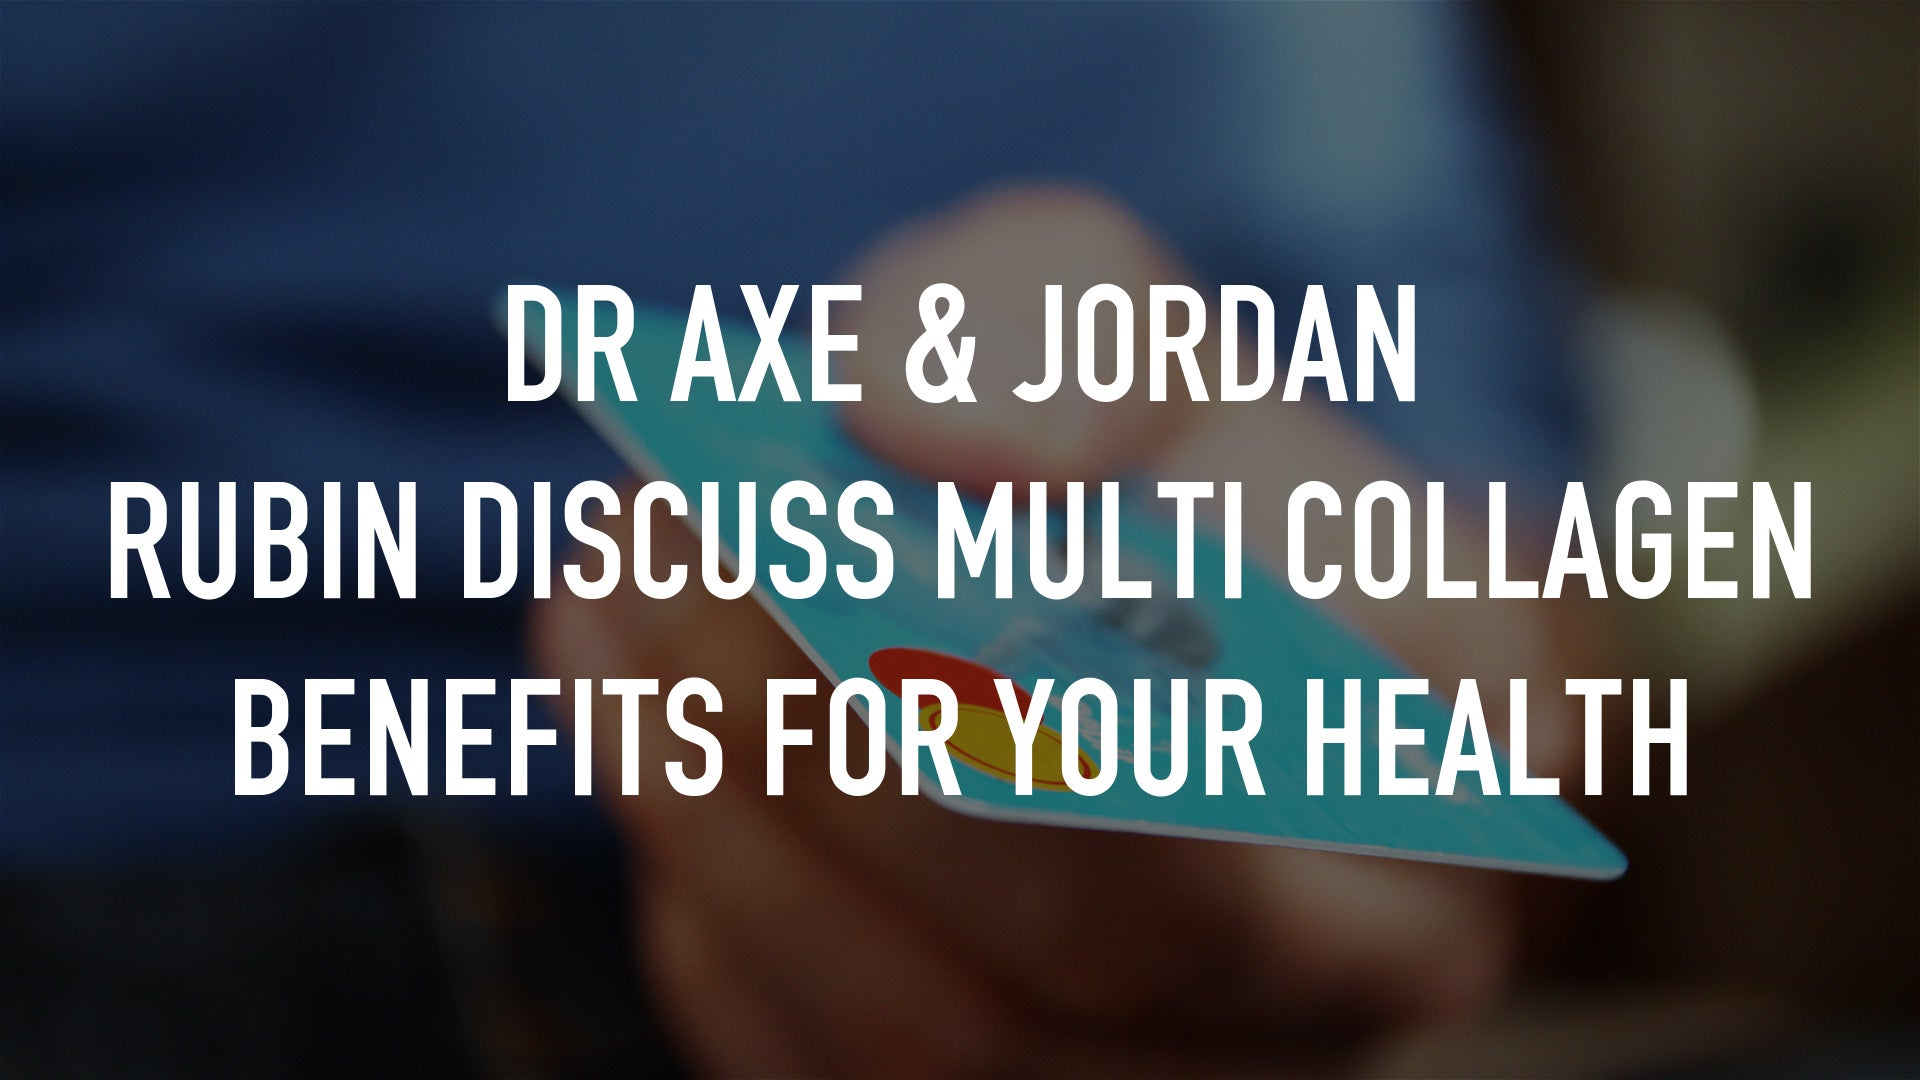 Dr Axe & Jordan Rubin discuss Multi Collagen Benefits for your health